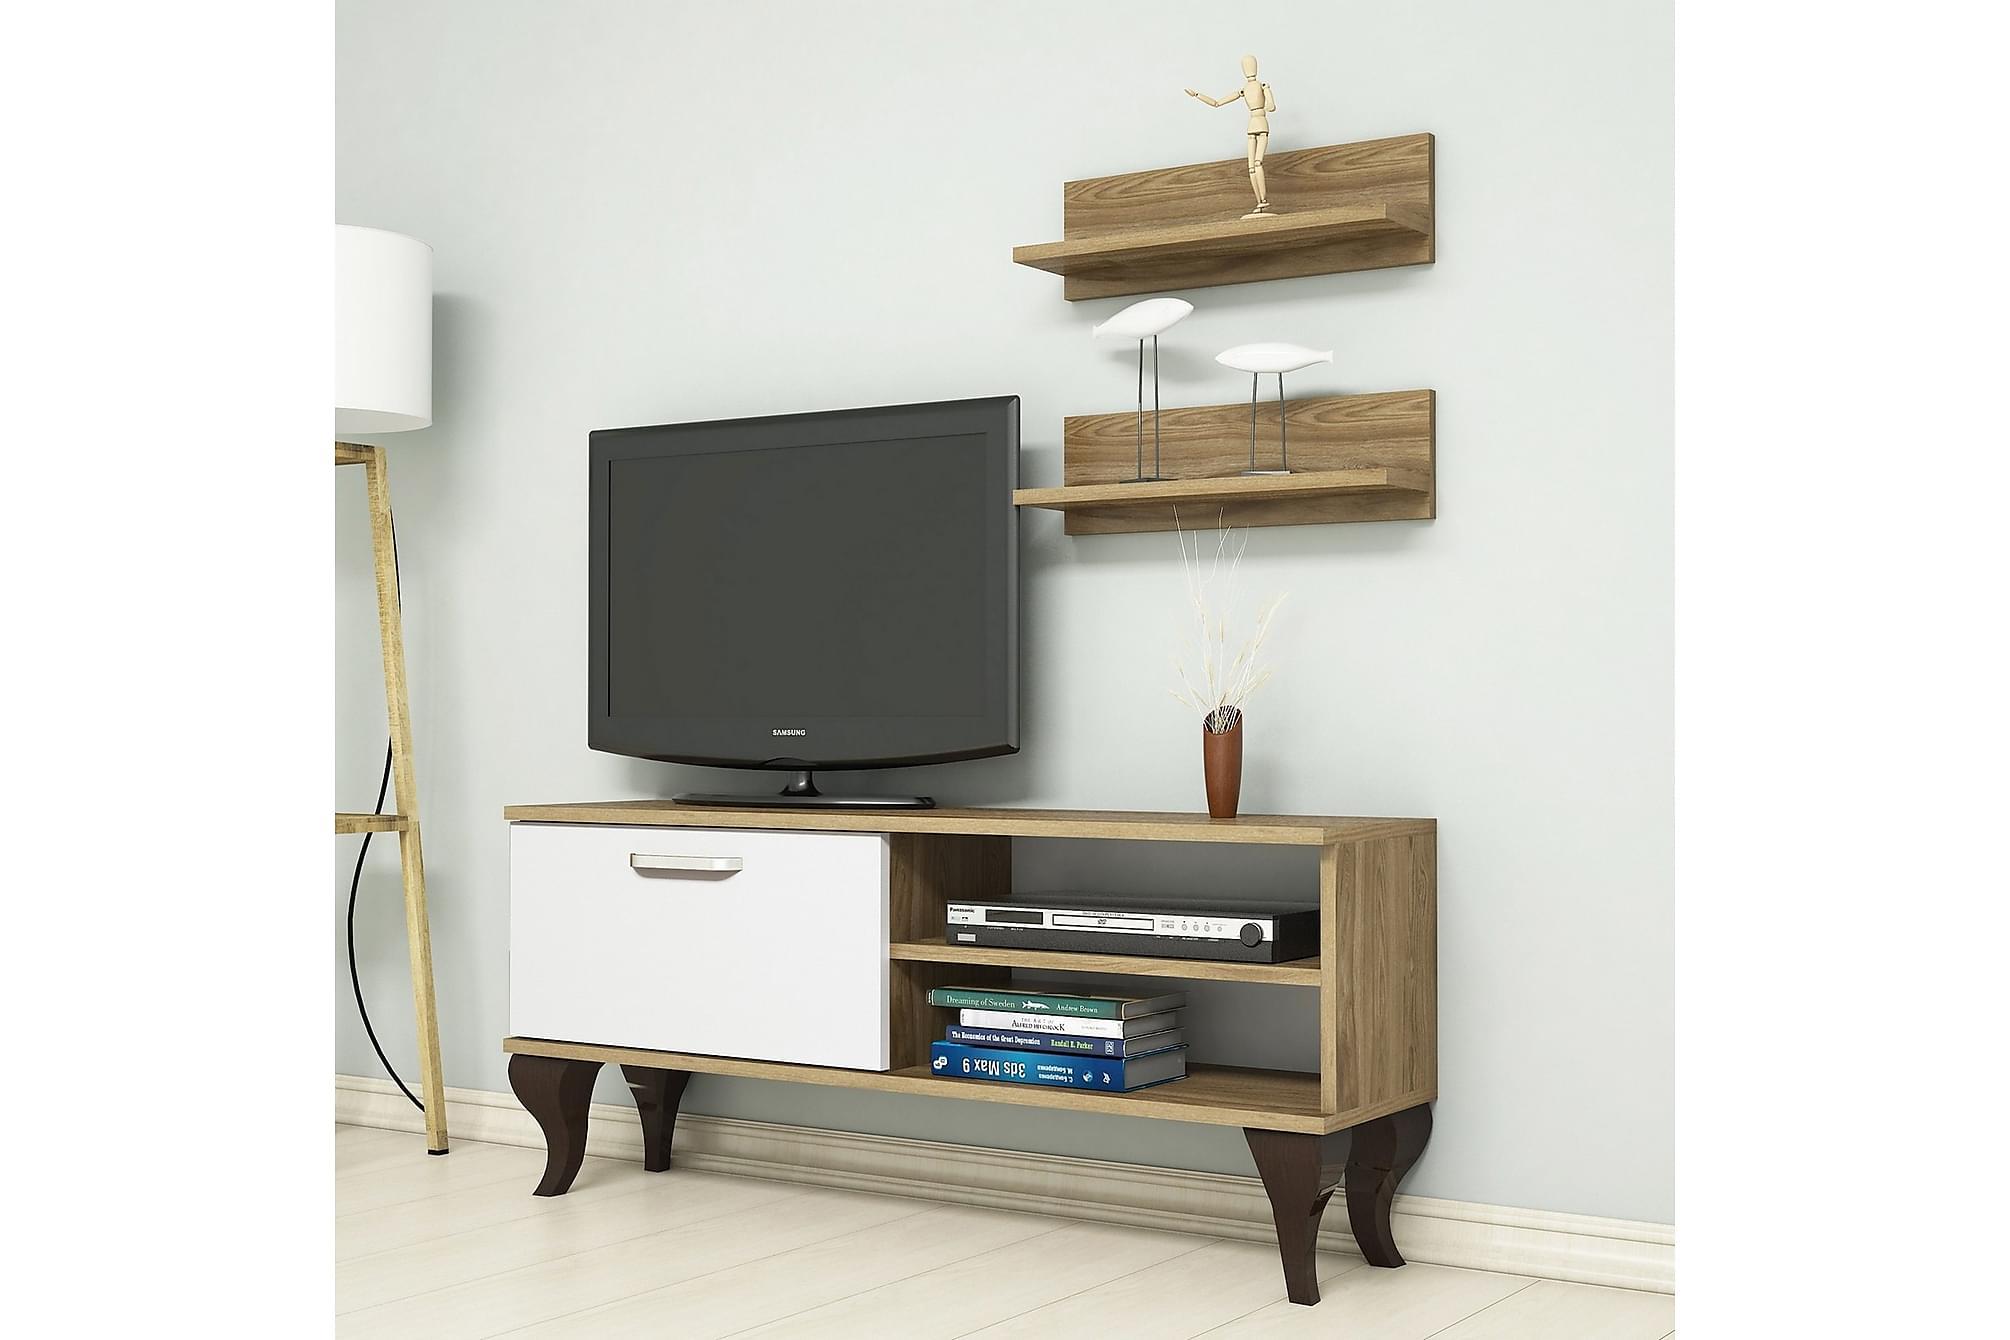 ANEESIA TV-Möbelset 120 cm Valnöt/Vit, Tv-möbelset